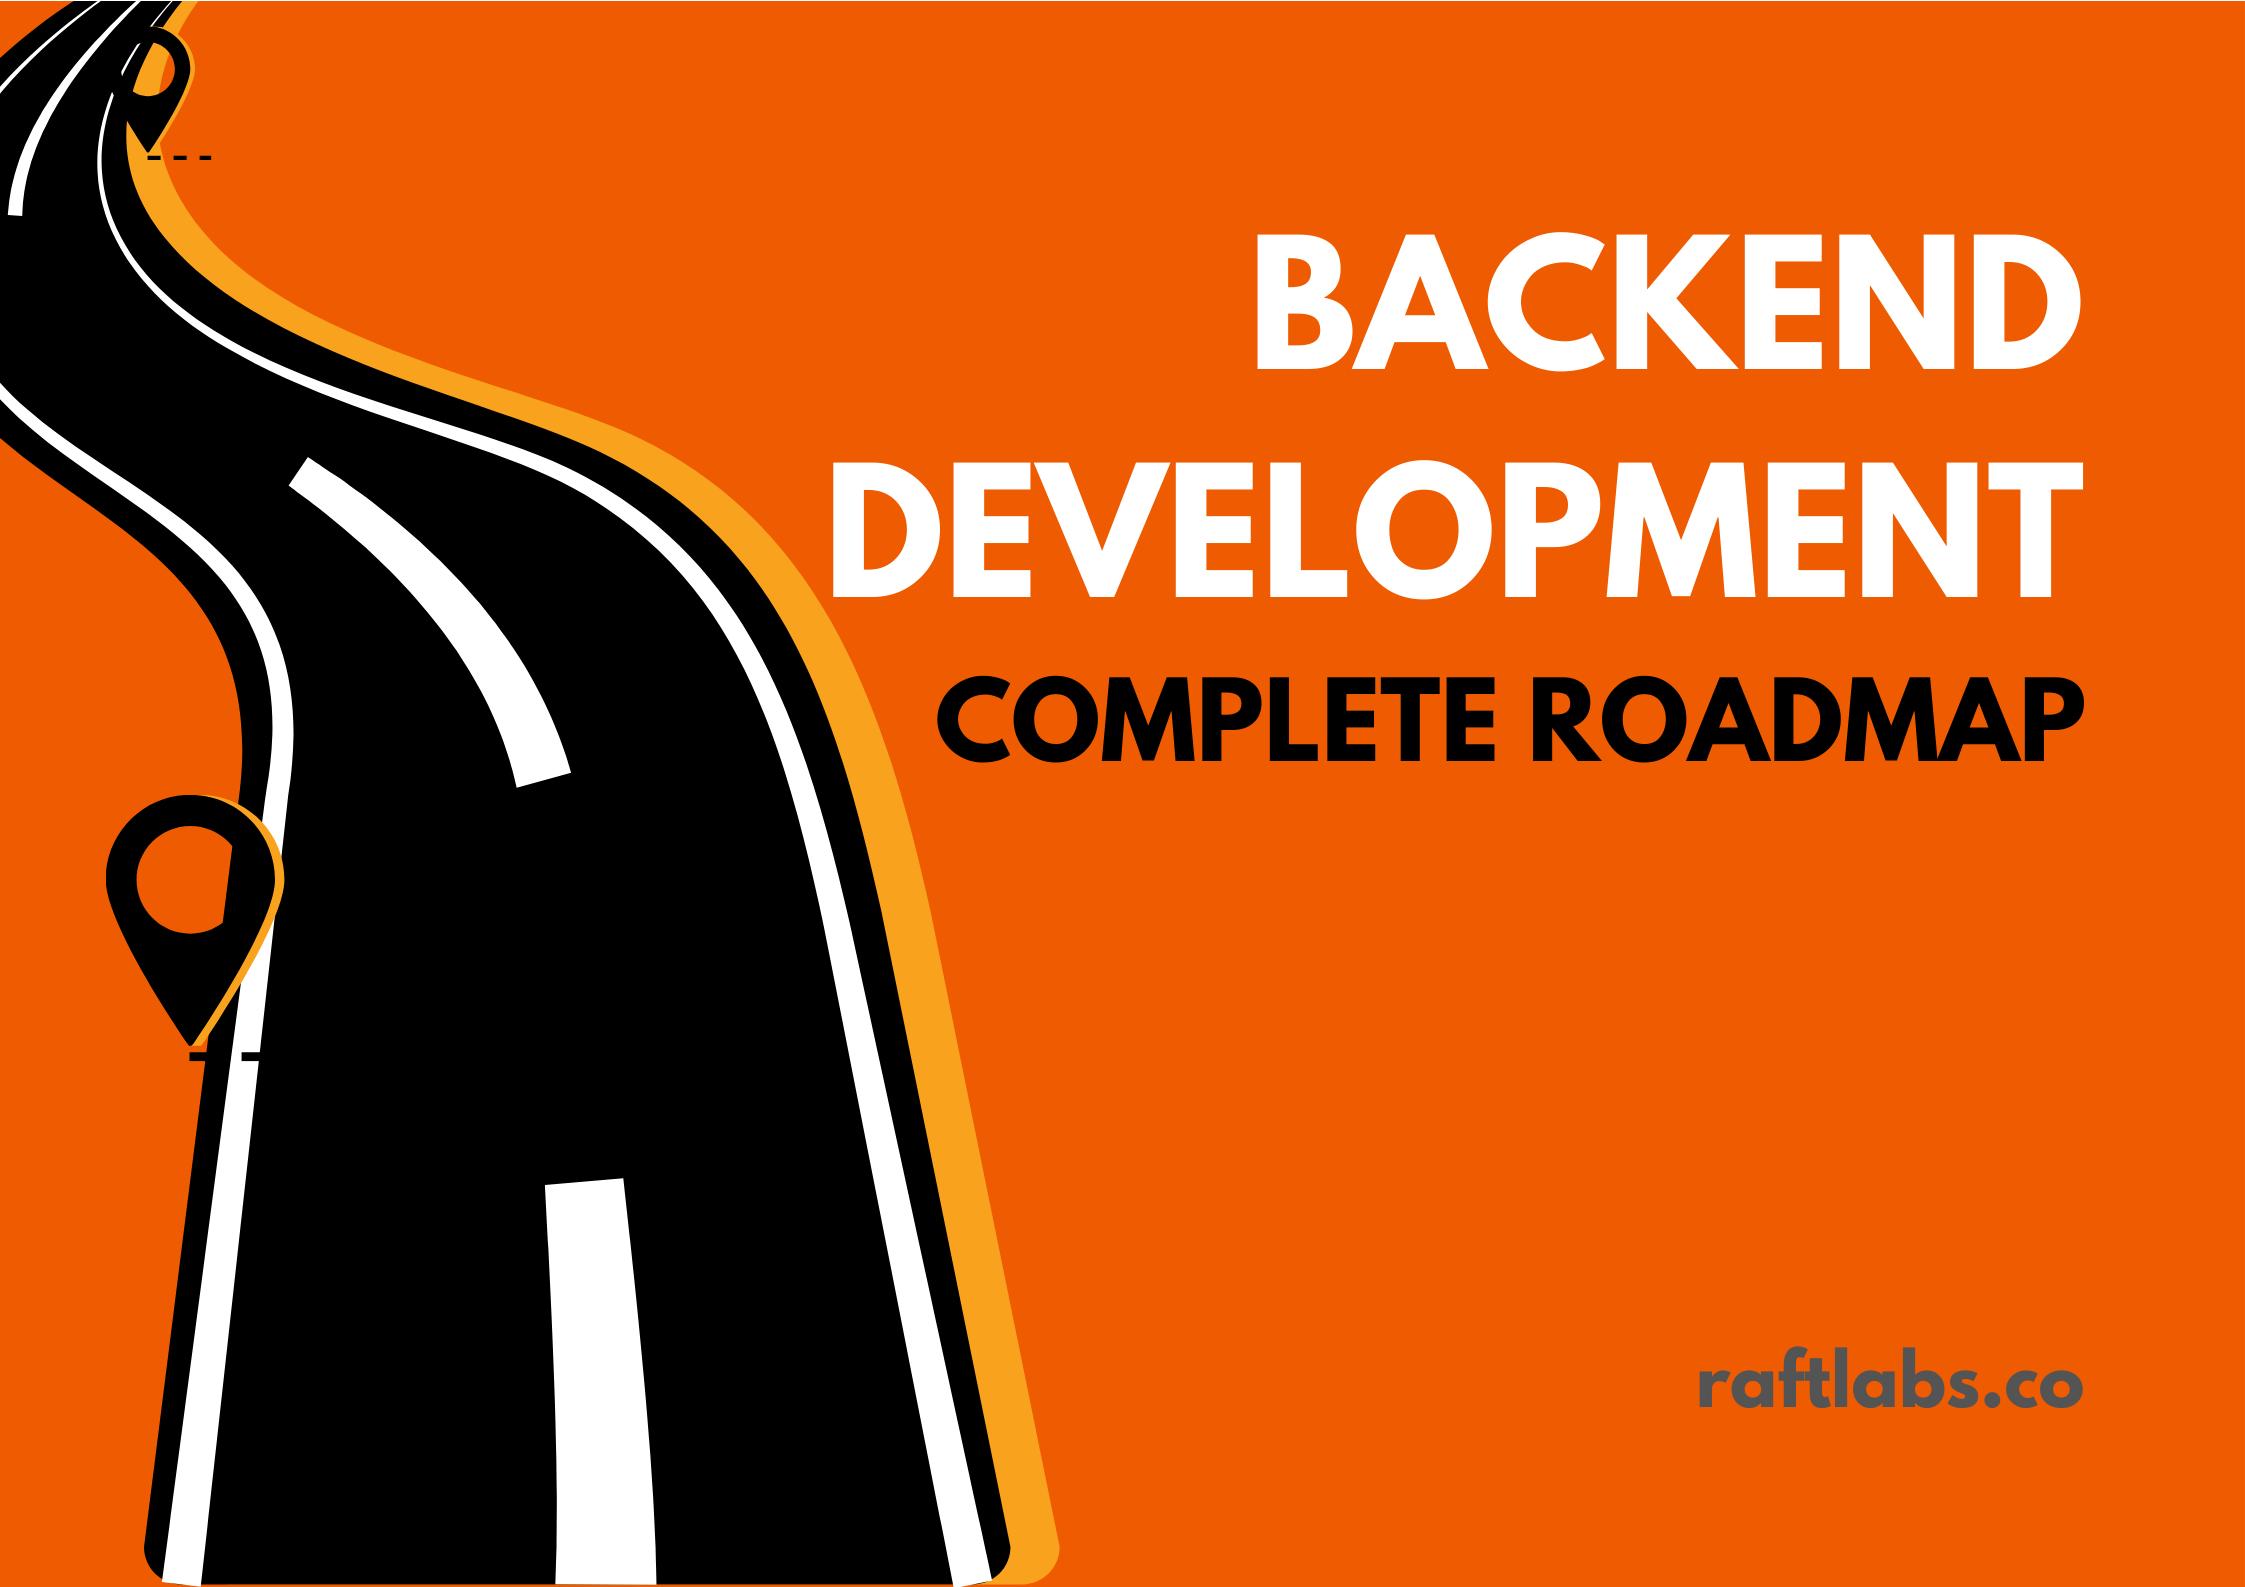 Thumbnail of Backend Developer - Complete Roadmap